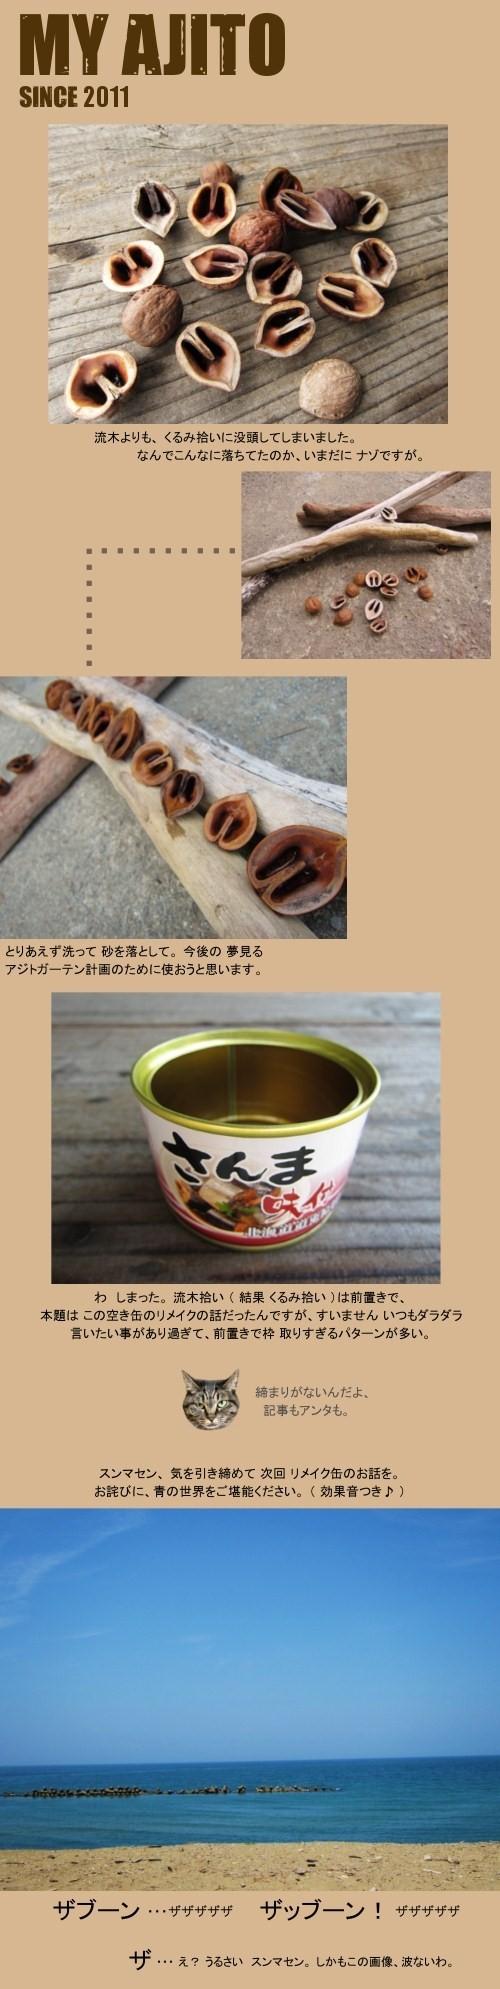 ryubo_4.jpg